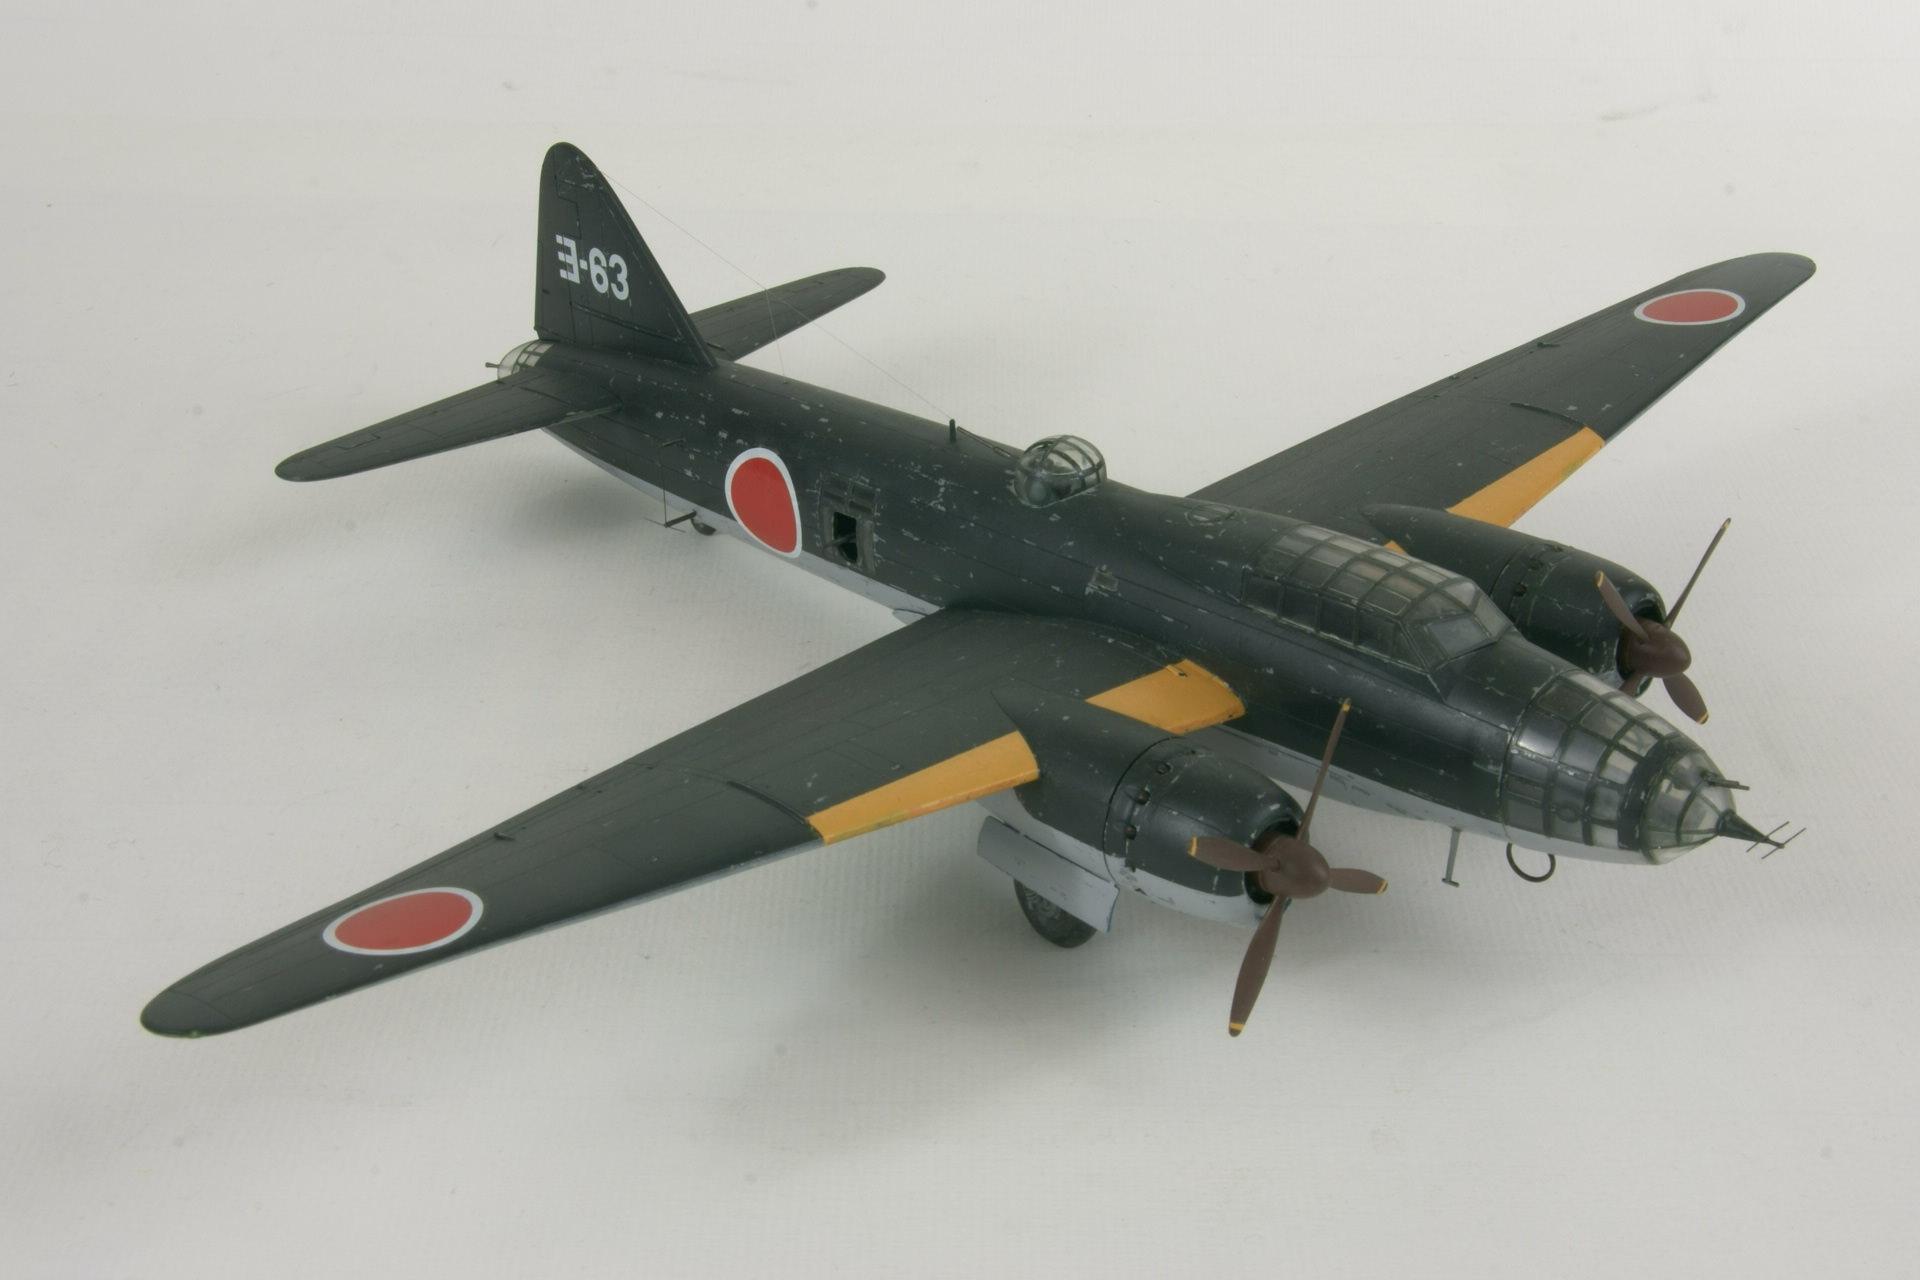 Mitsubishi g4m2a model 24 betty 4 1